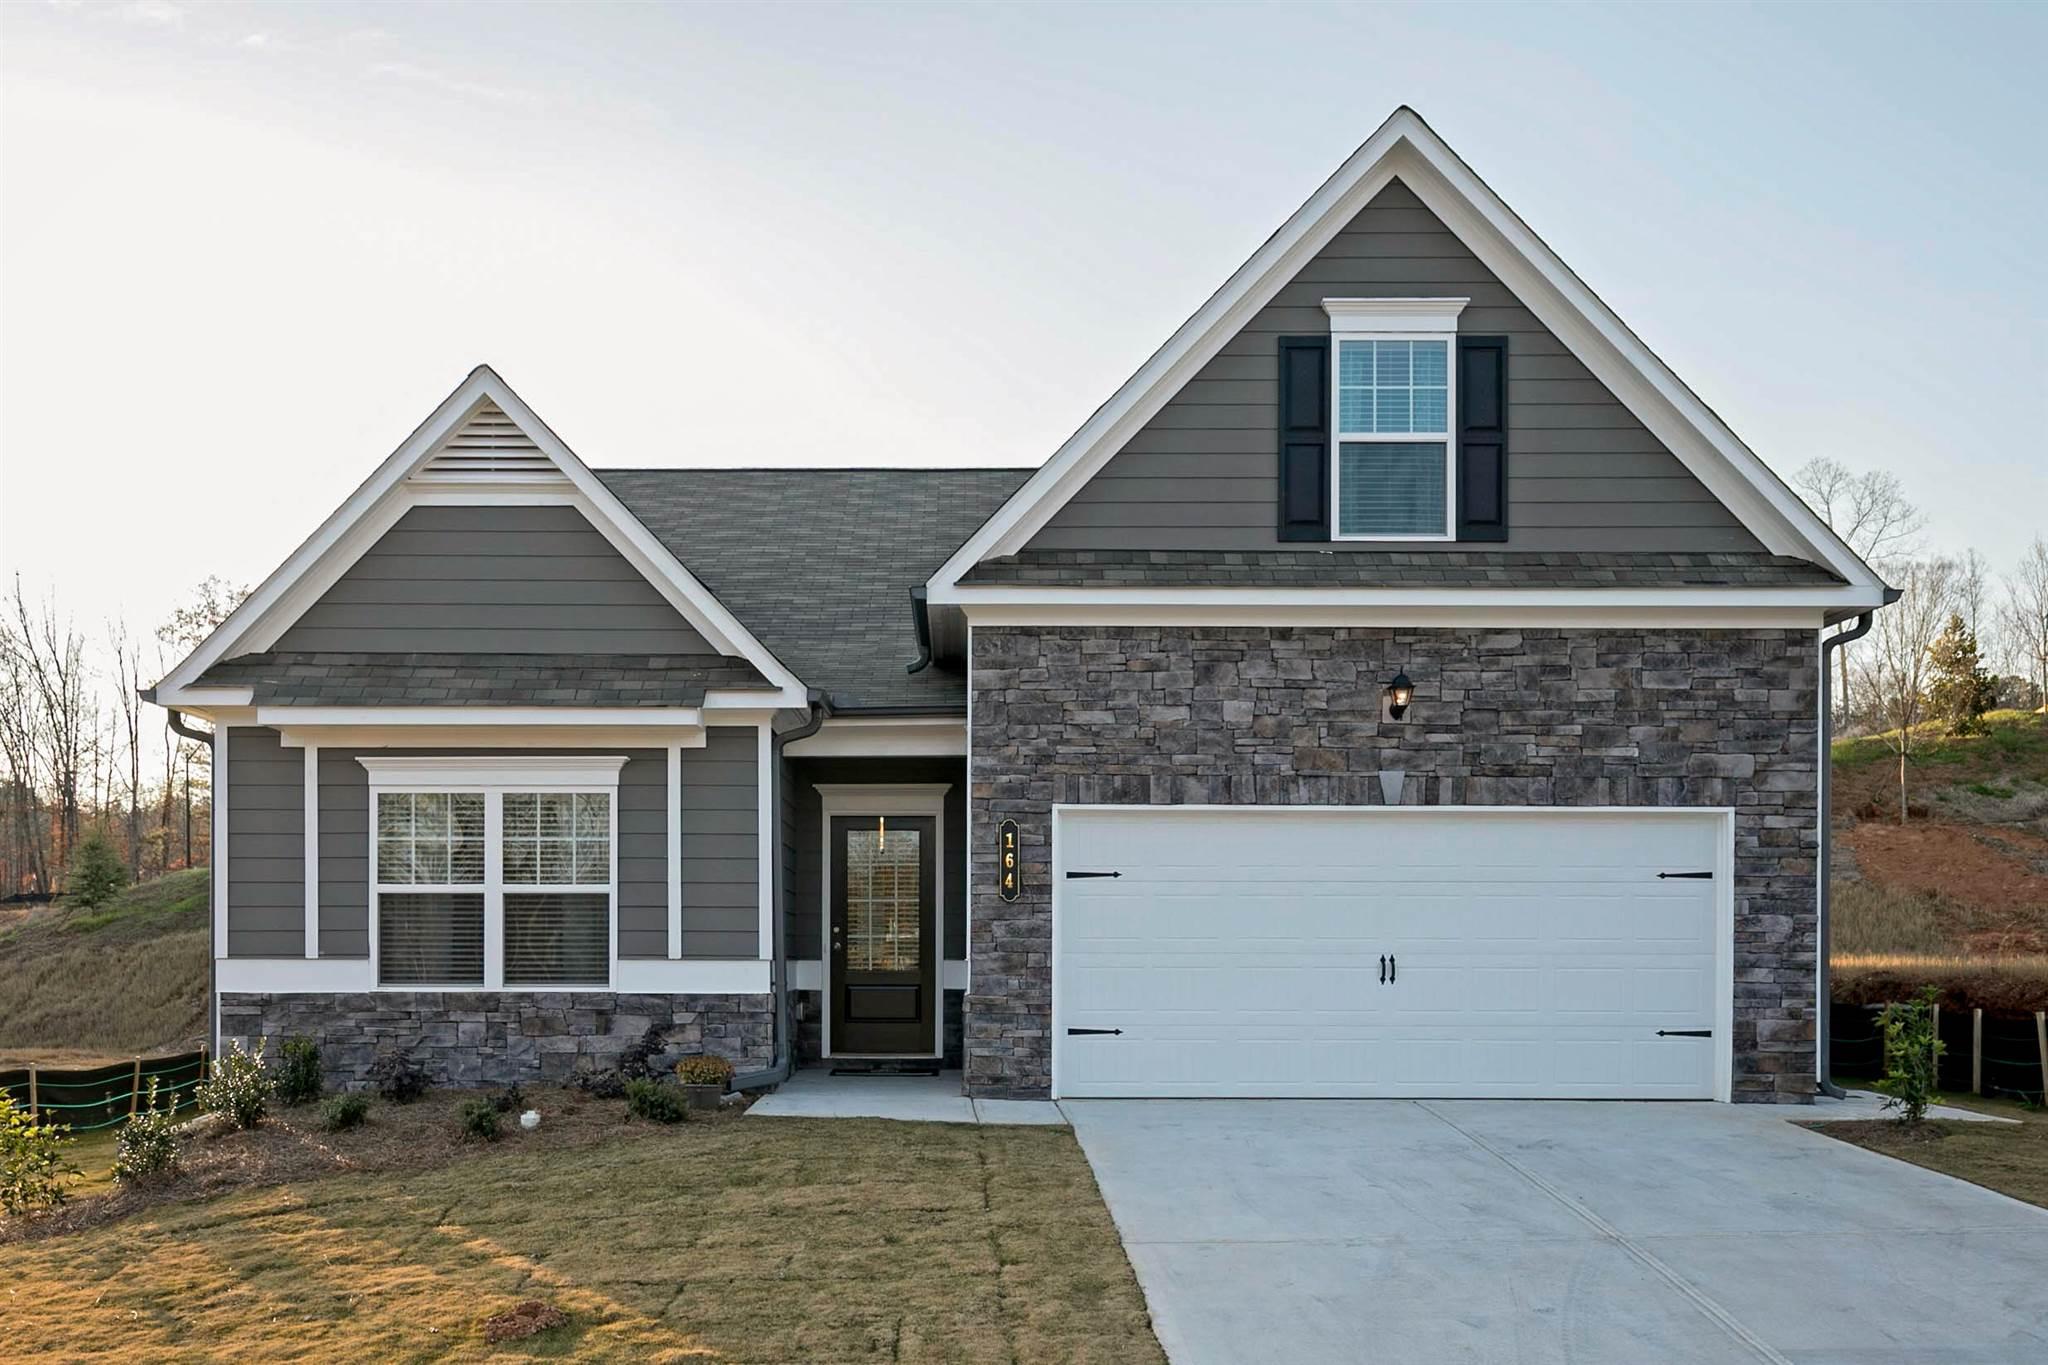 113 MEGAN COURT, Lake Oconee in Putnam County, GA 31024 Home for Sale